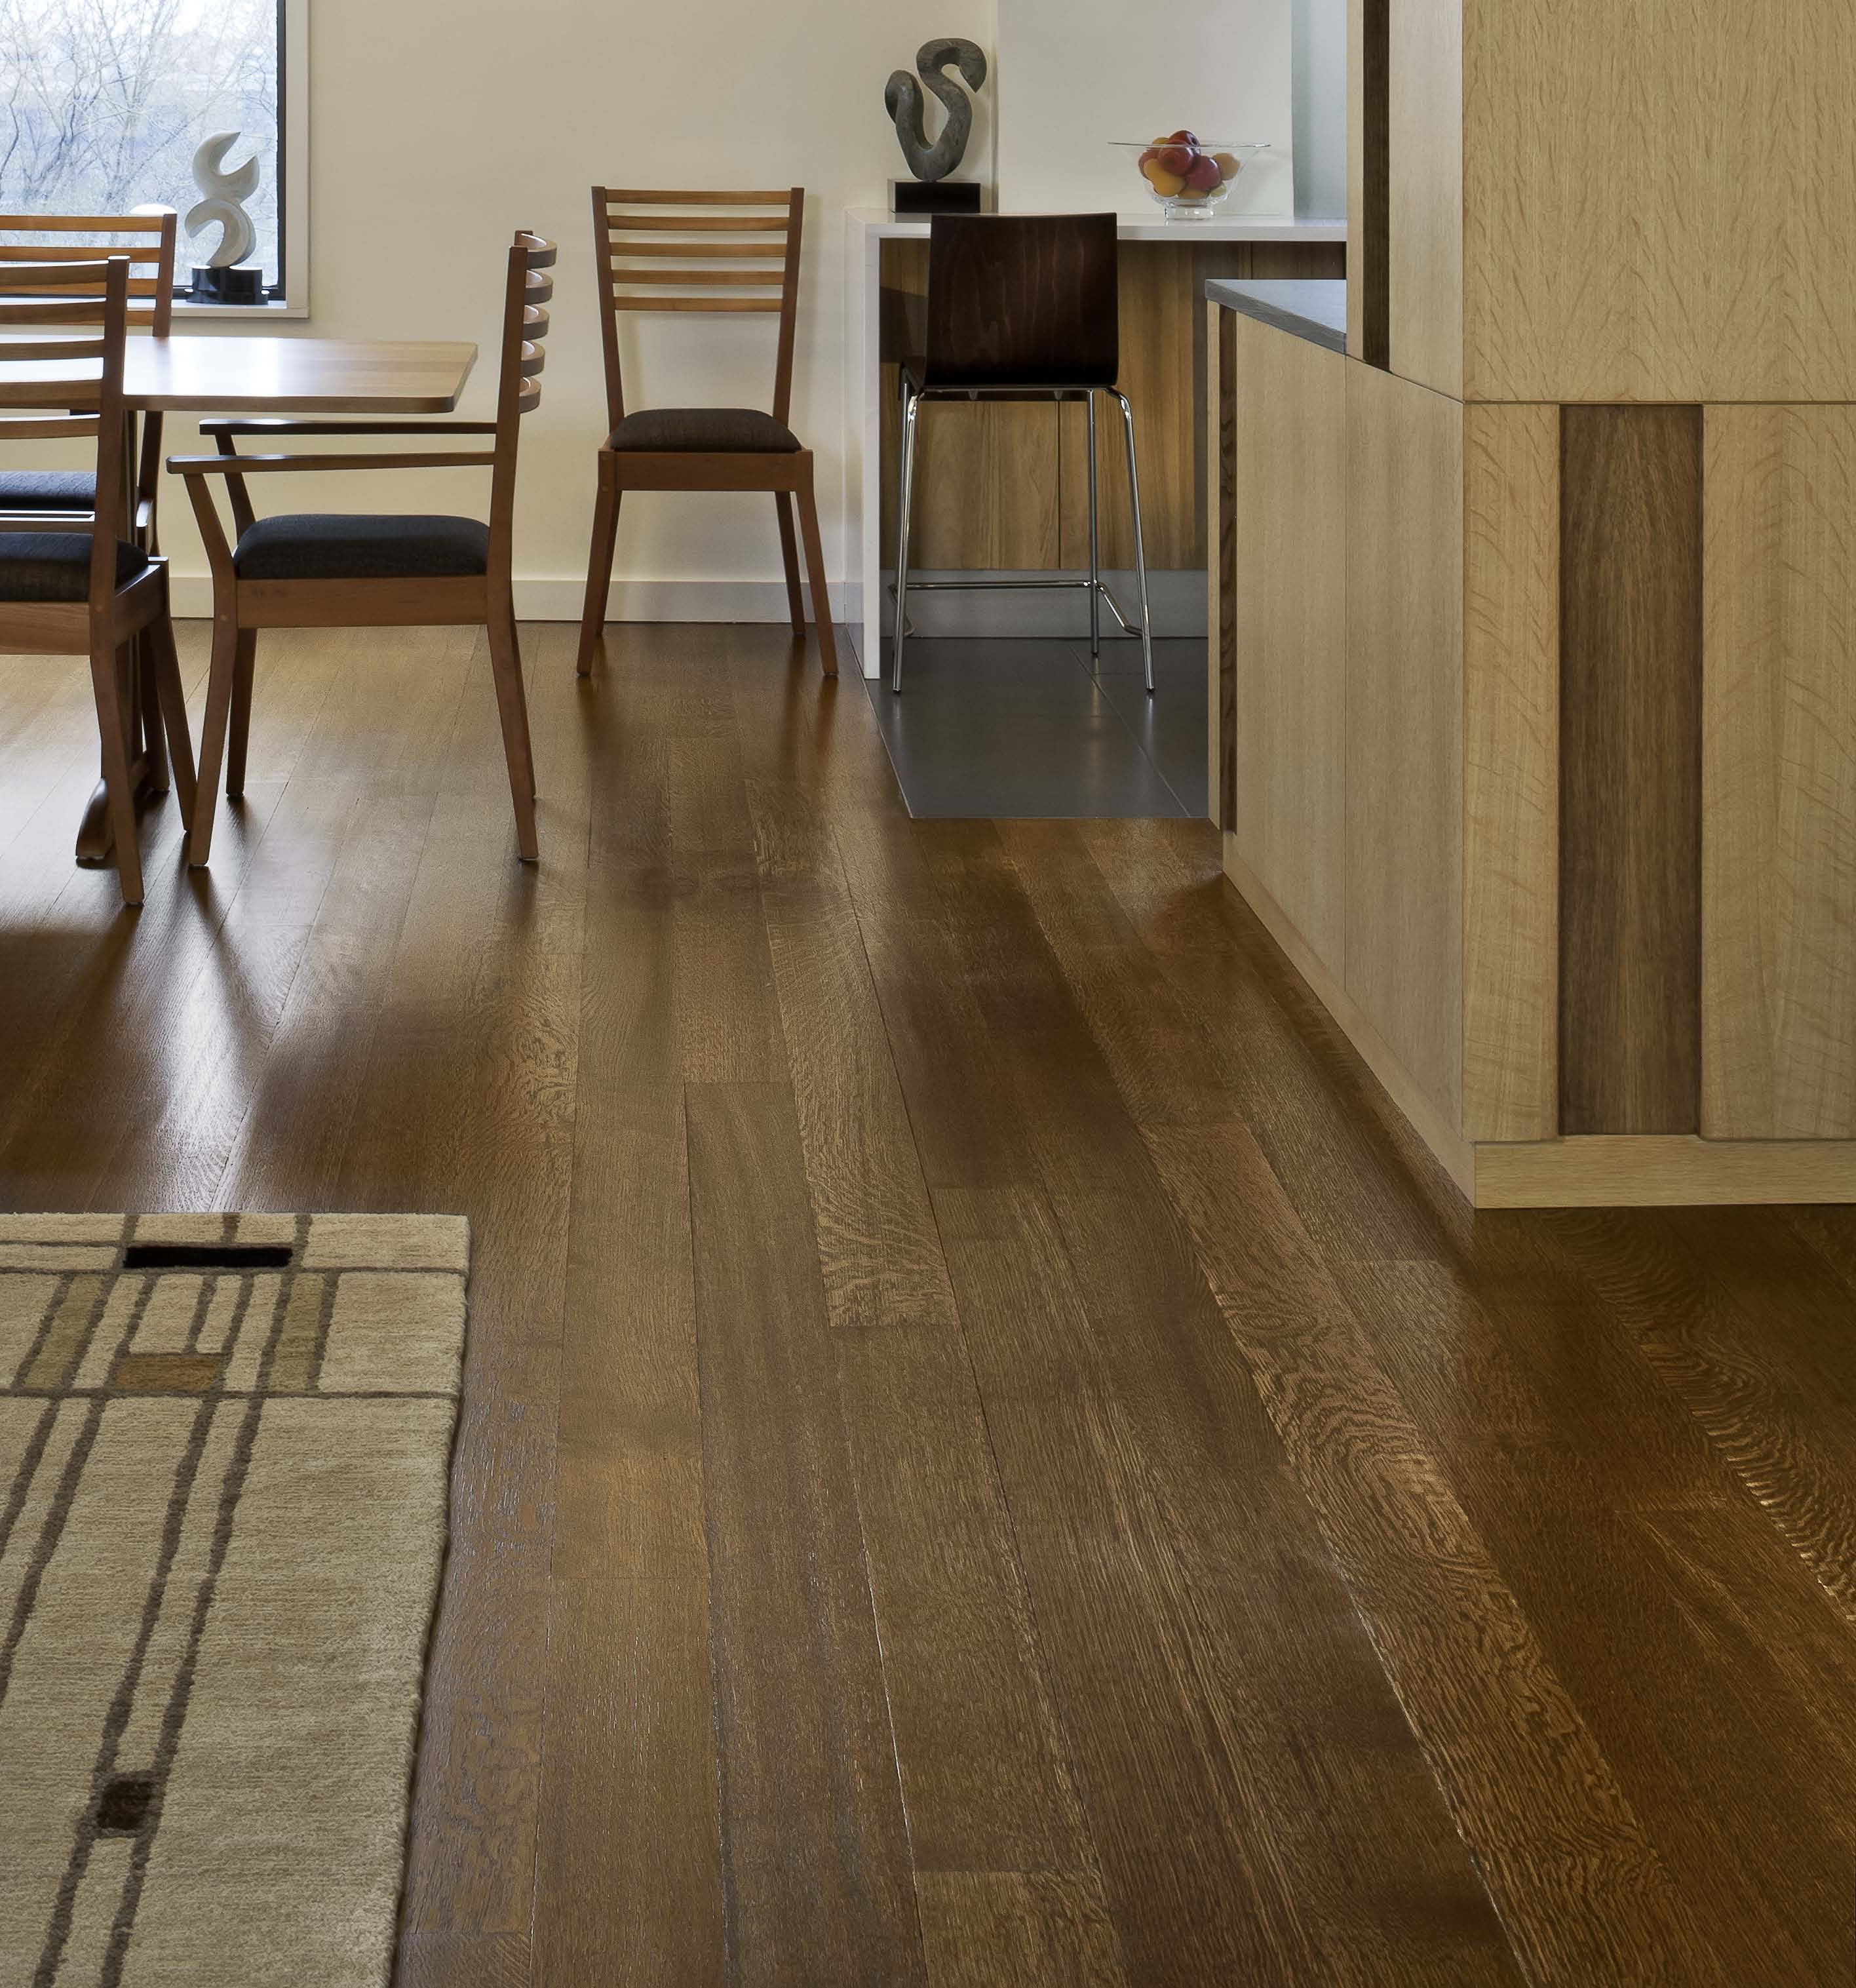 cleaning prefinished hardwood floors of solid wood flooring floor plan ideas regarding full size of bedroom trendy discount hardwood flooring 11 hull rift sawn white oak floor manhattan